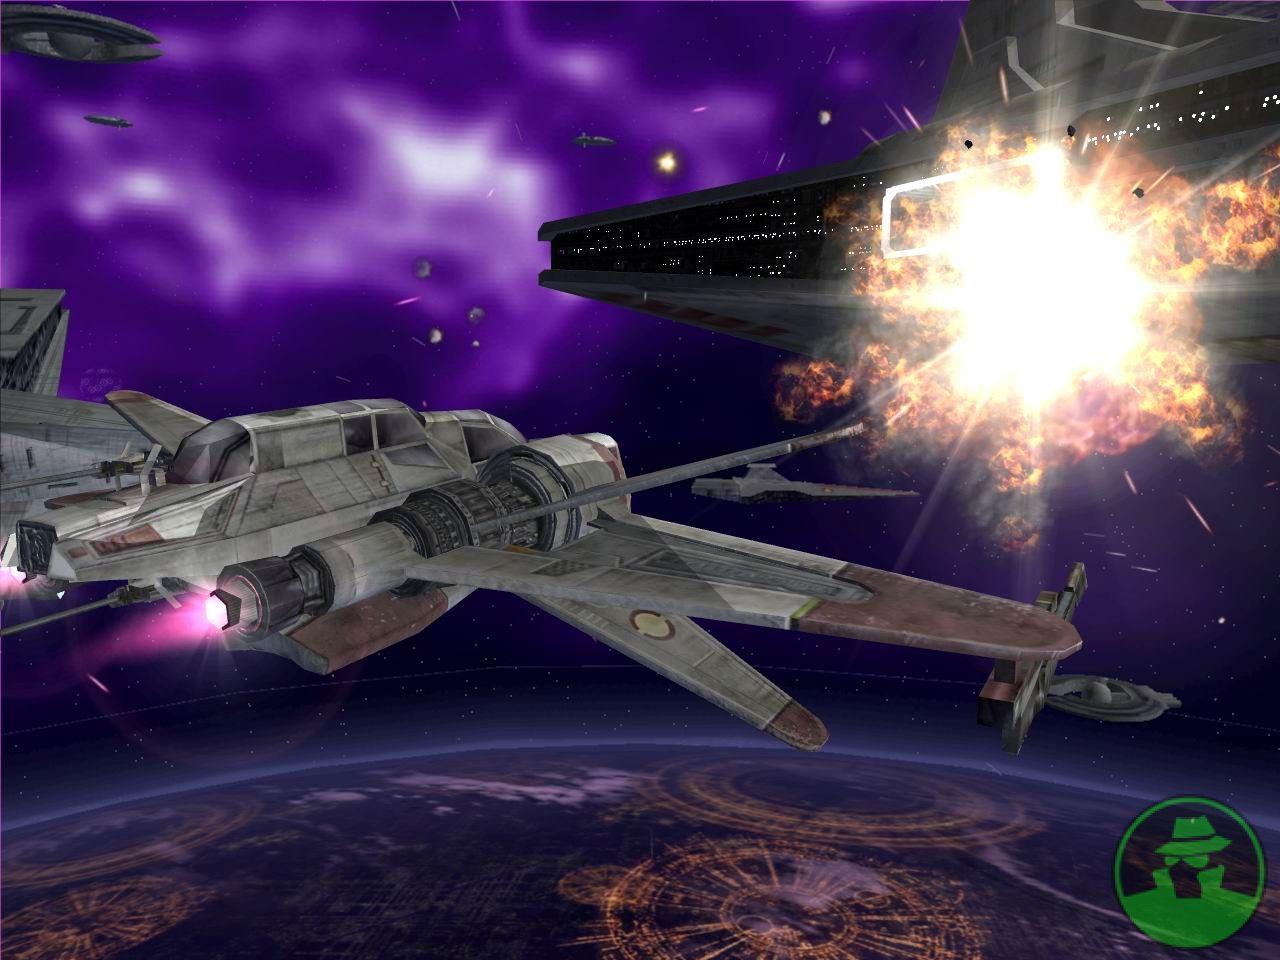 Star Wars Battlefront 2 Background: Star Wars Battlefront 2 Wallpaper